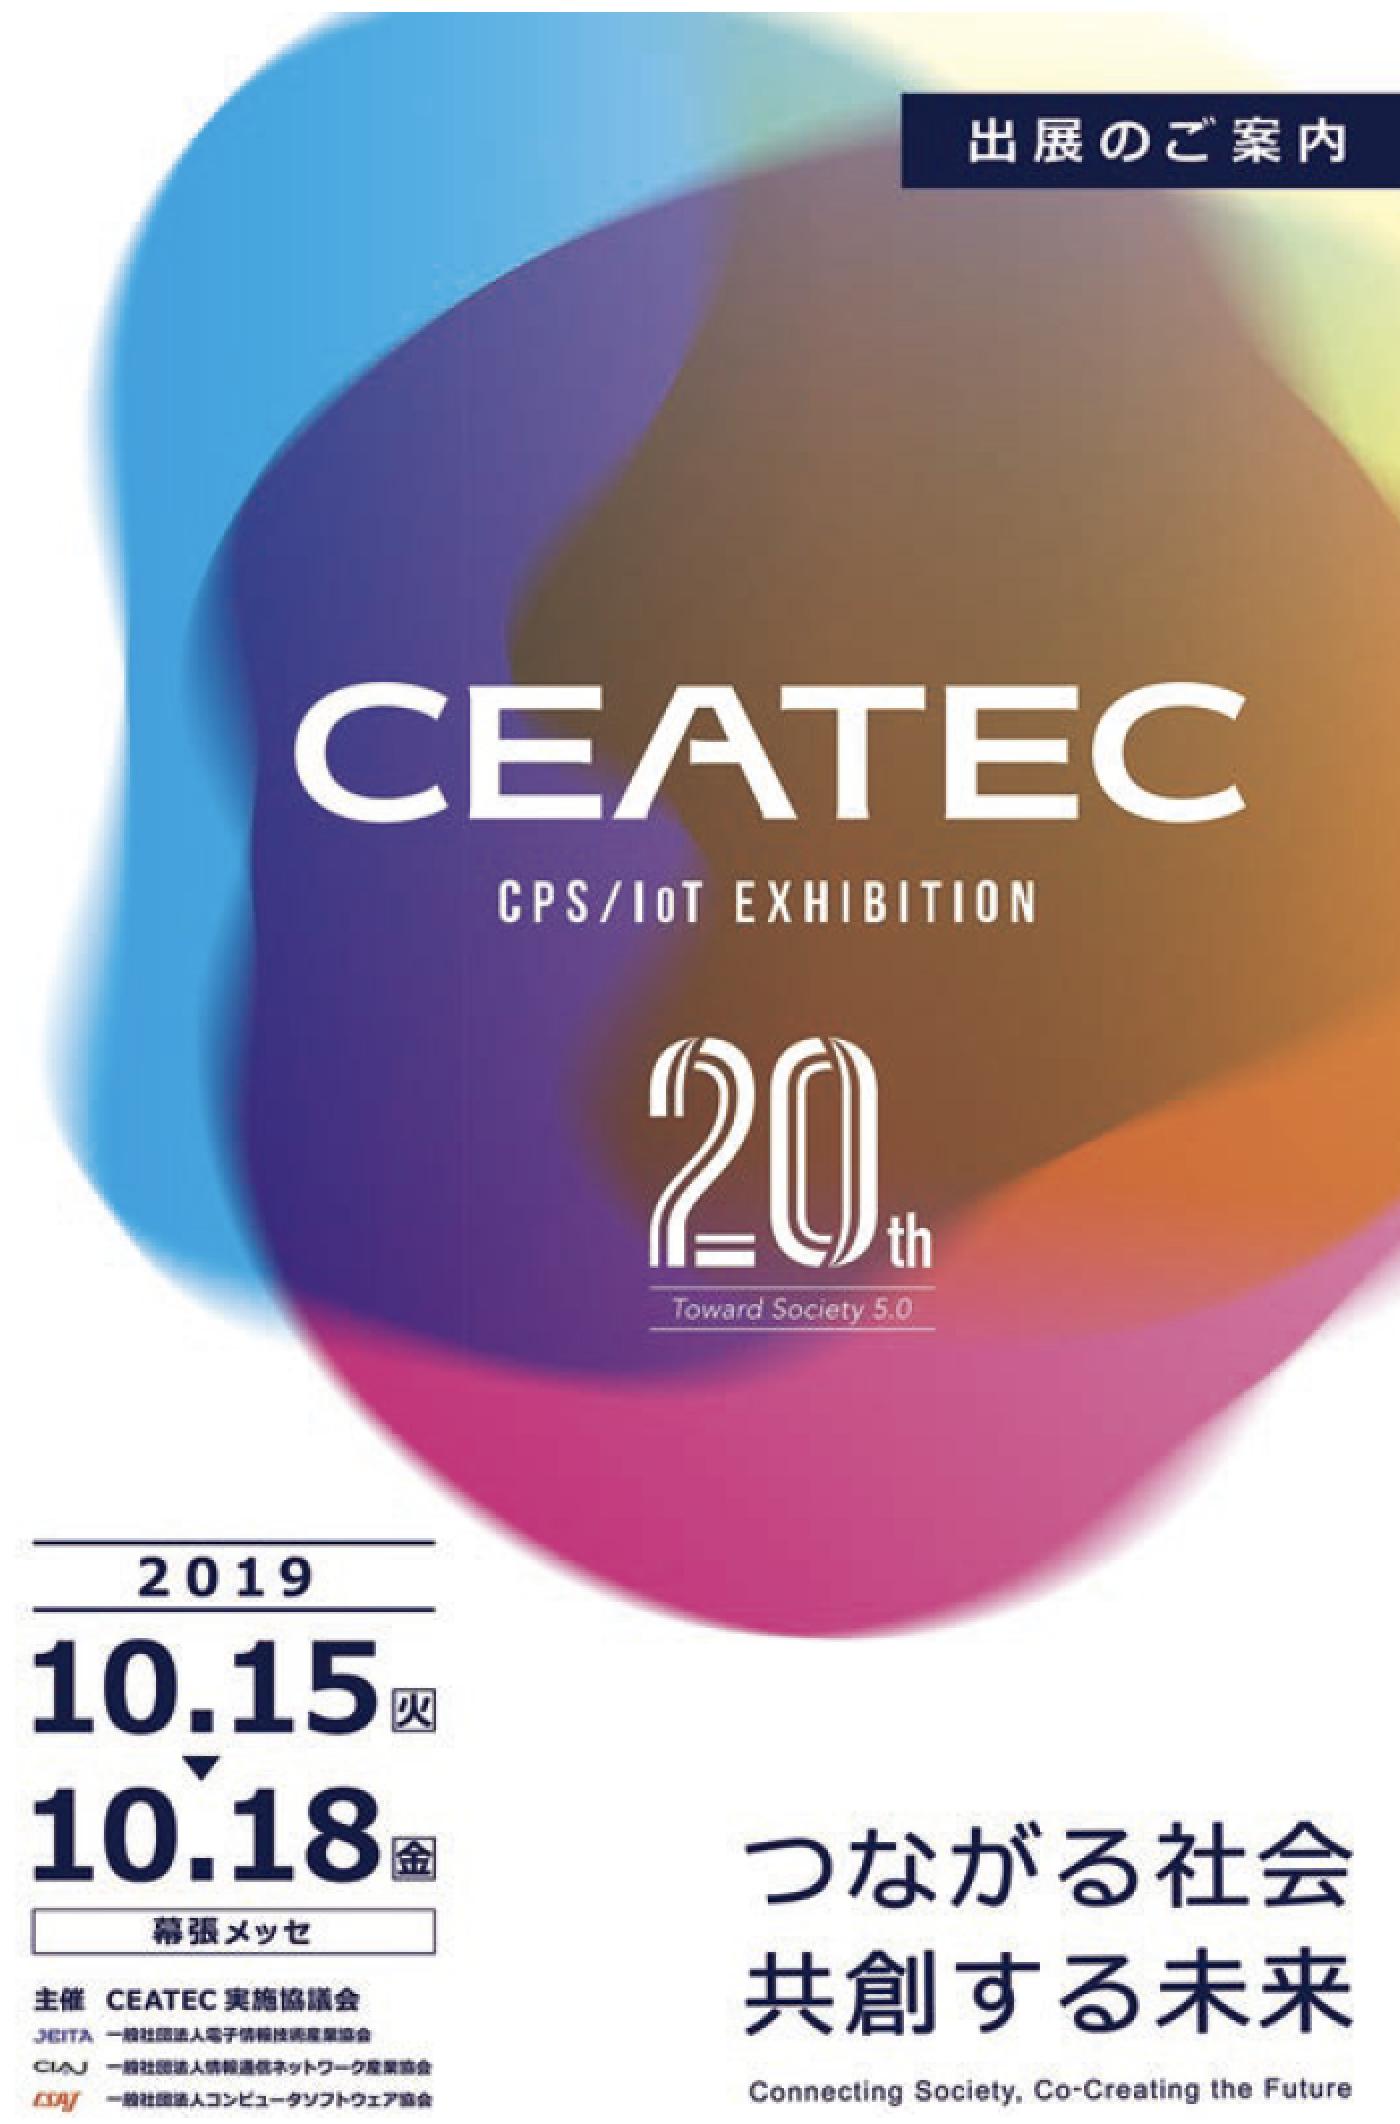 「Society 5.0」実現目指す産業・業種の革新技術が集結 『CEATEC JAPAN 2019』 の画像